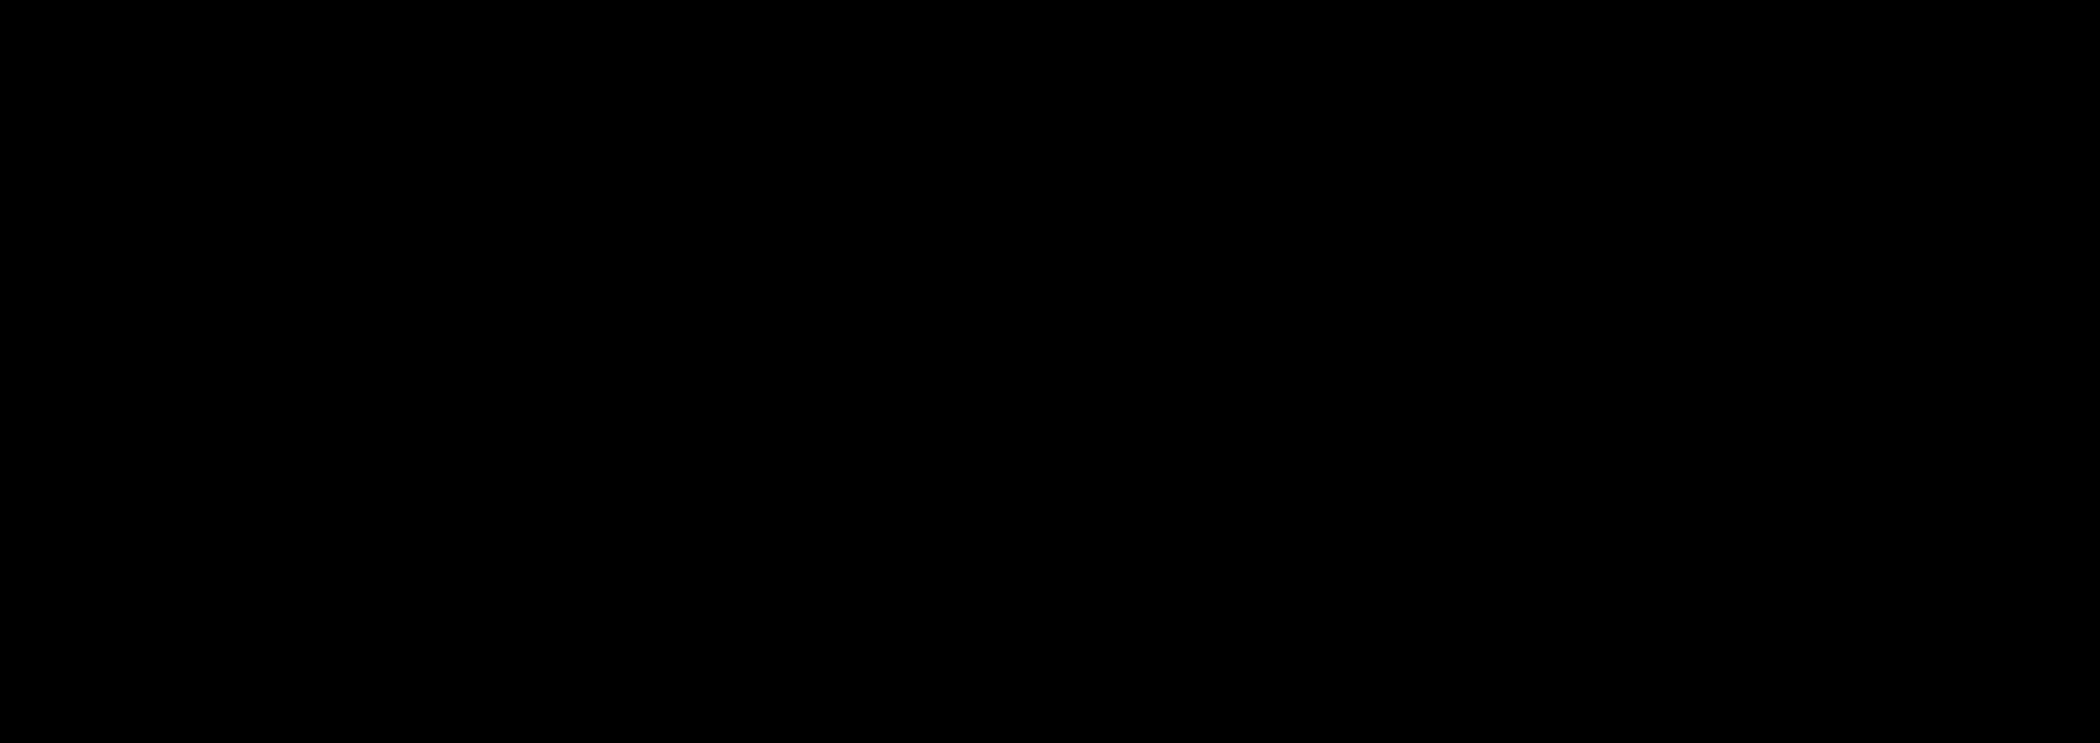 BClogoBlack